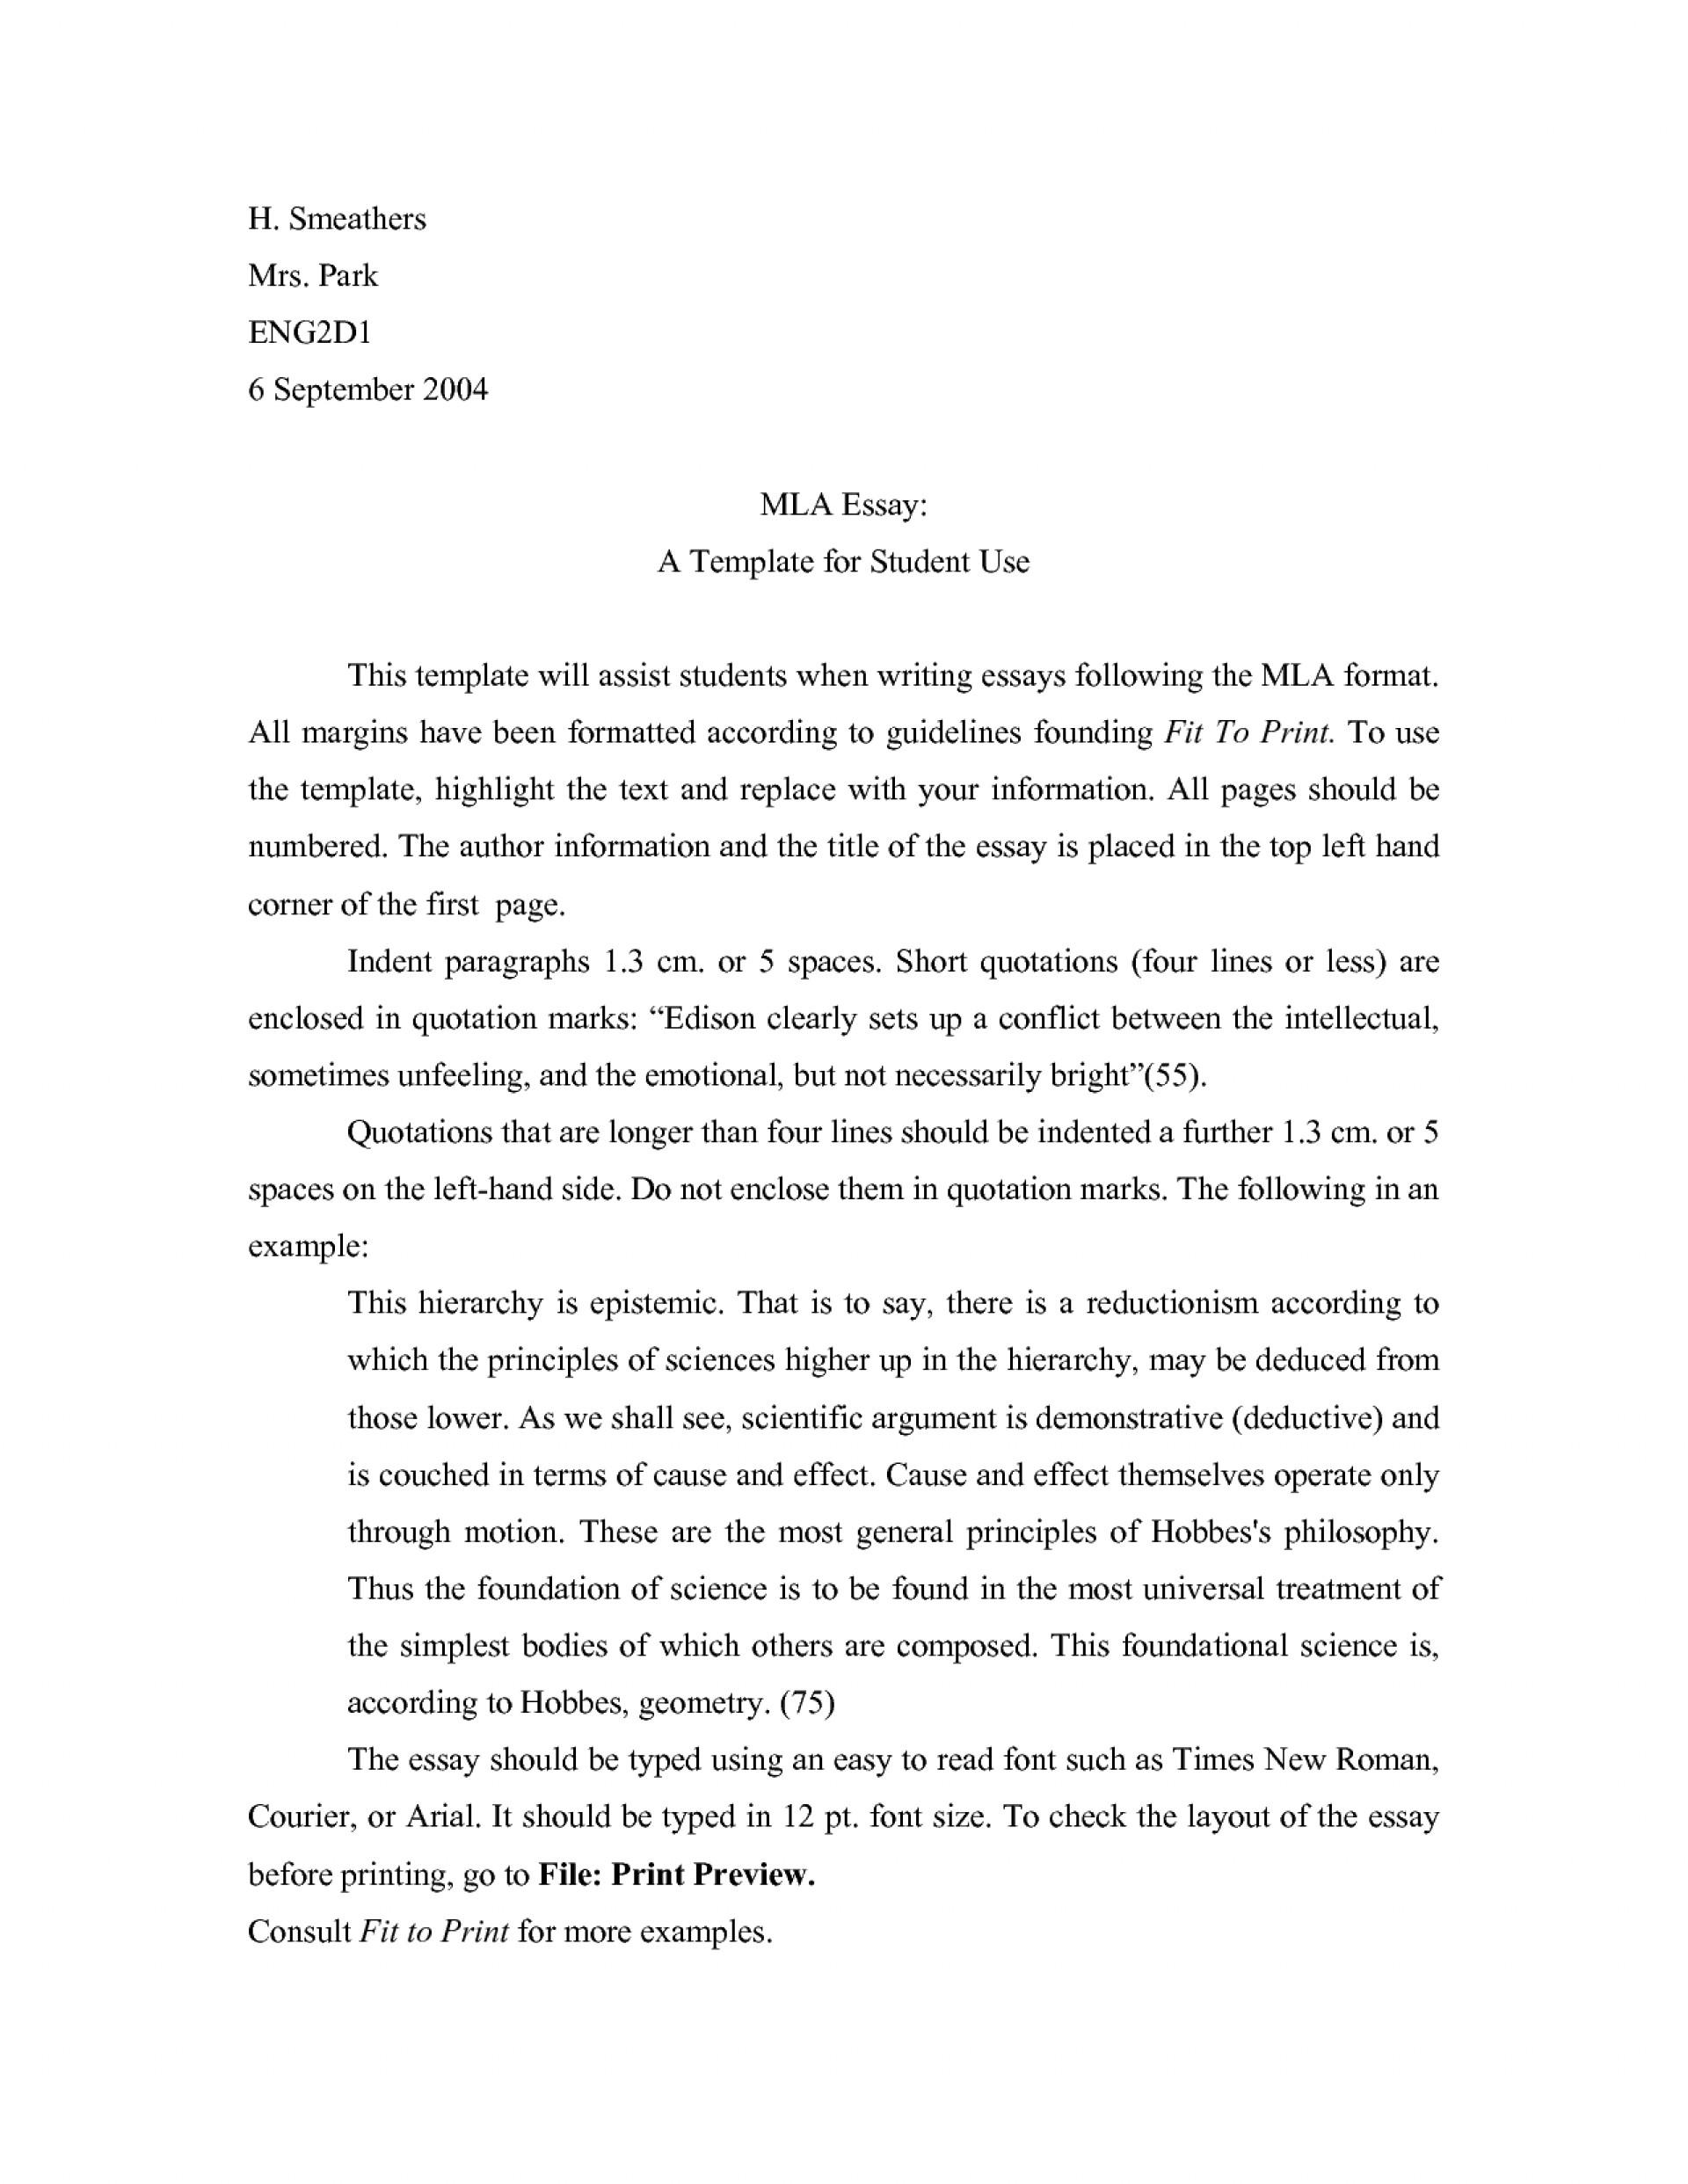 013 Ideas Of Mla Format On Essay Targer Golden Dragon Wonderful College Sample Beautiful Example 2017 Comparison Narrative 1920